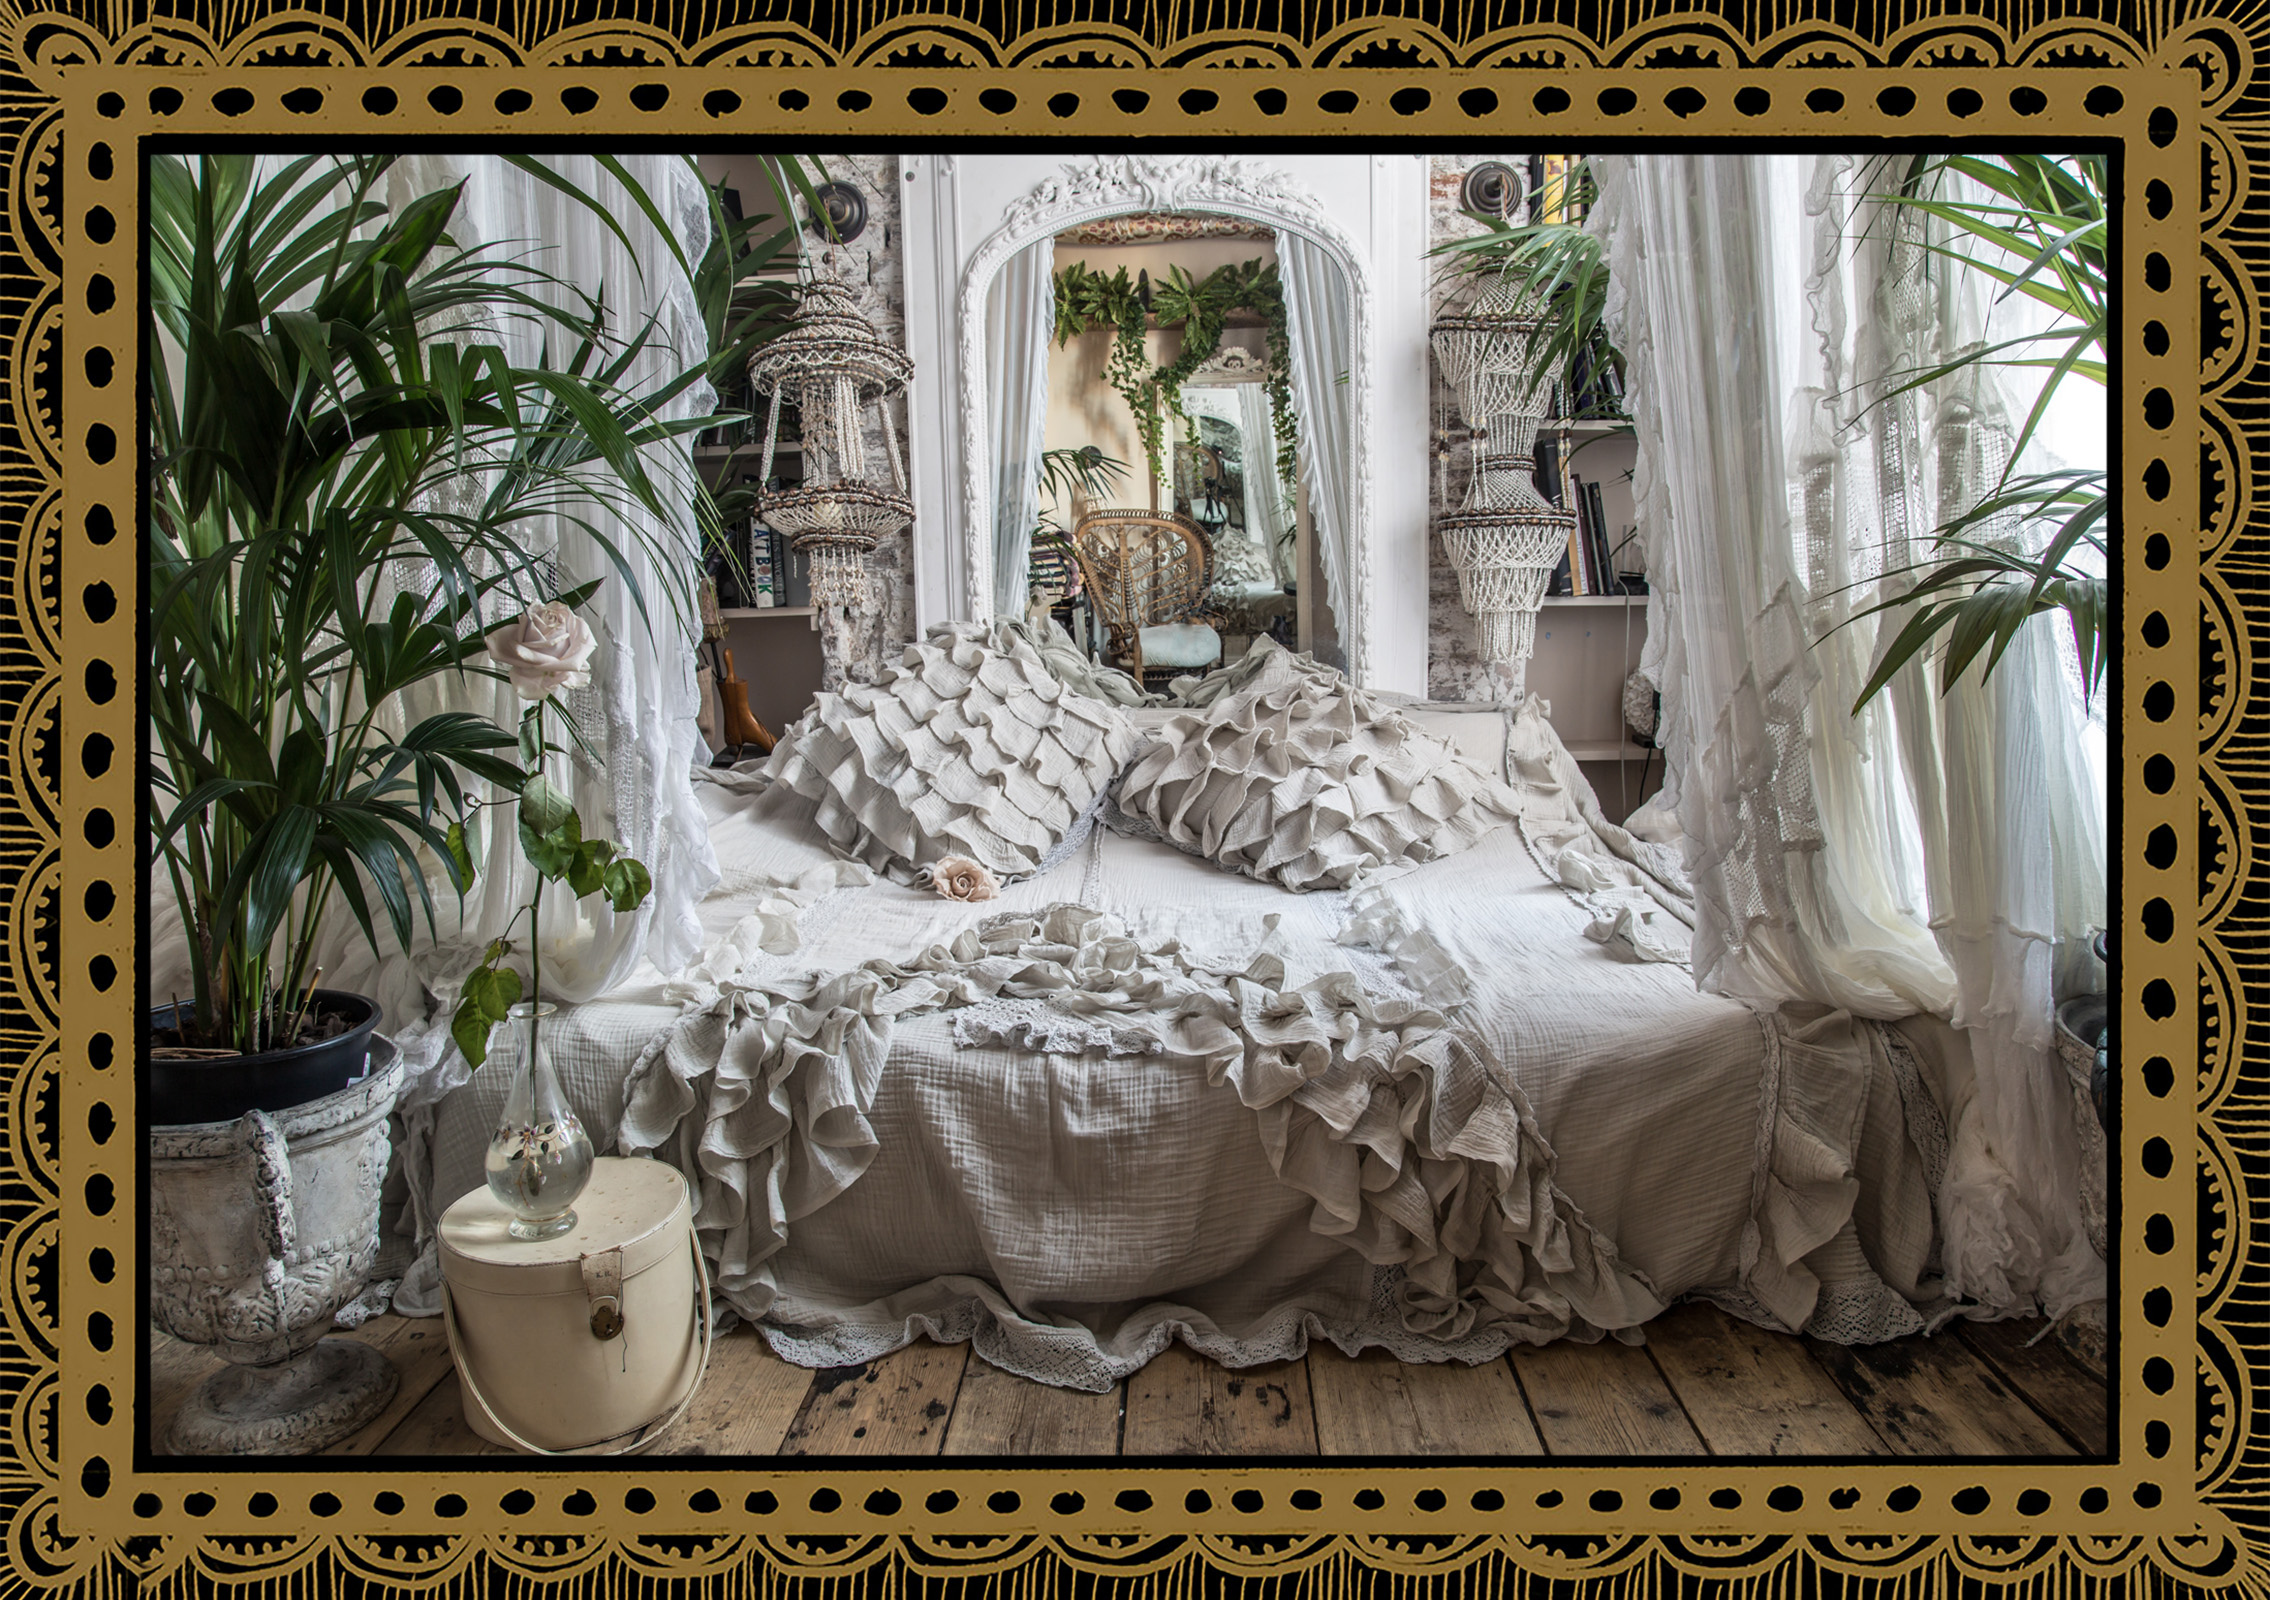 bed spread-2.jpg